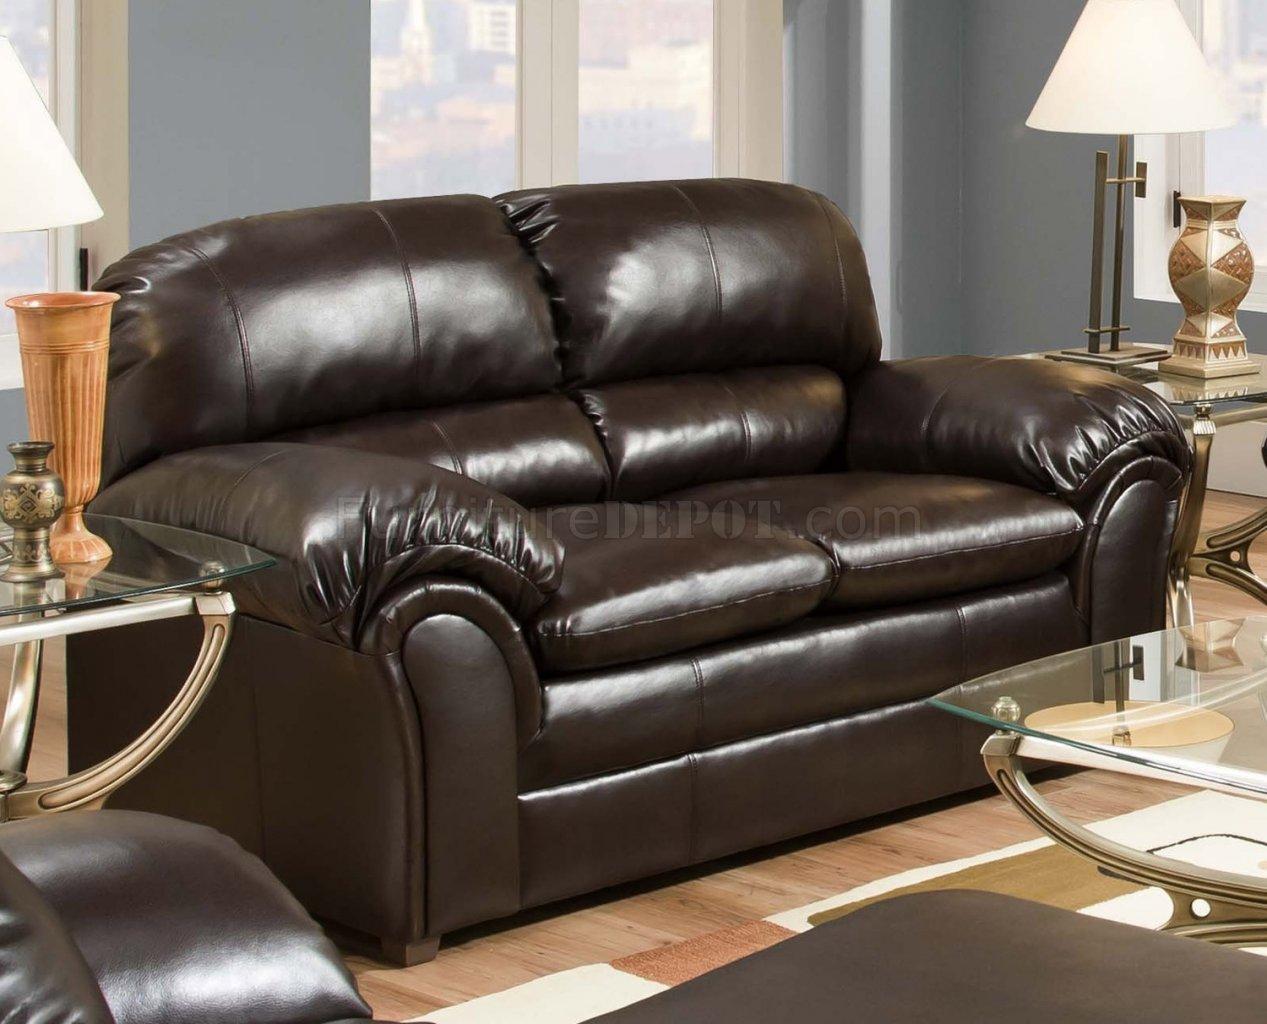 Vintage Bonded Leather Sofa Loveseat Set W Heavily Padded Back